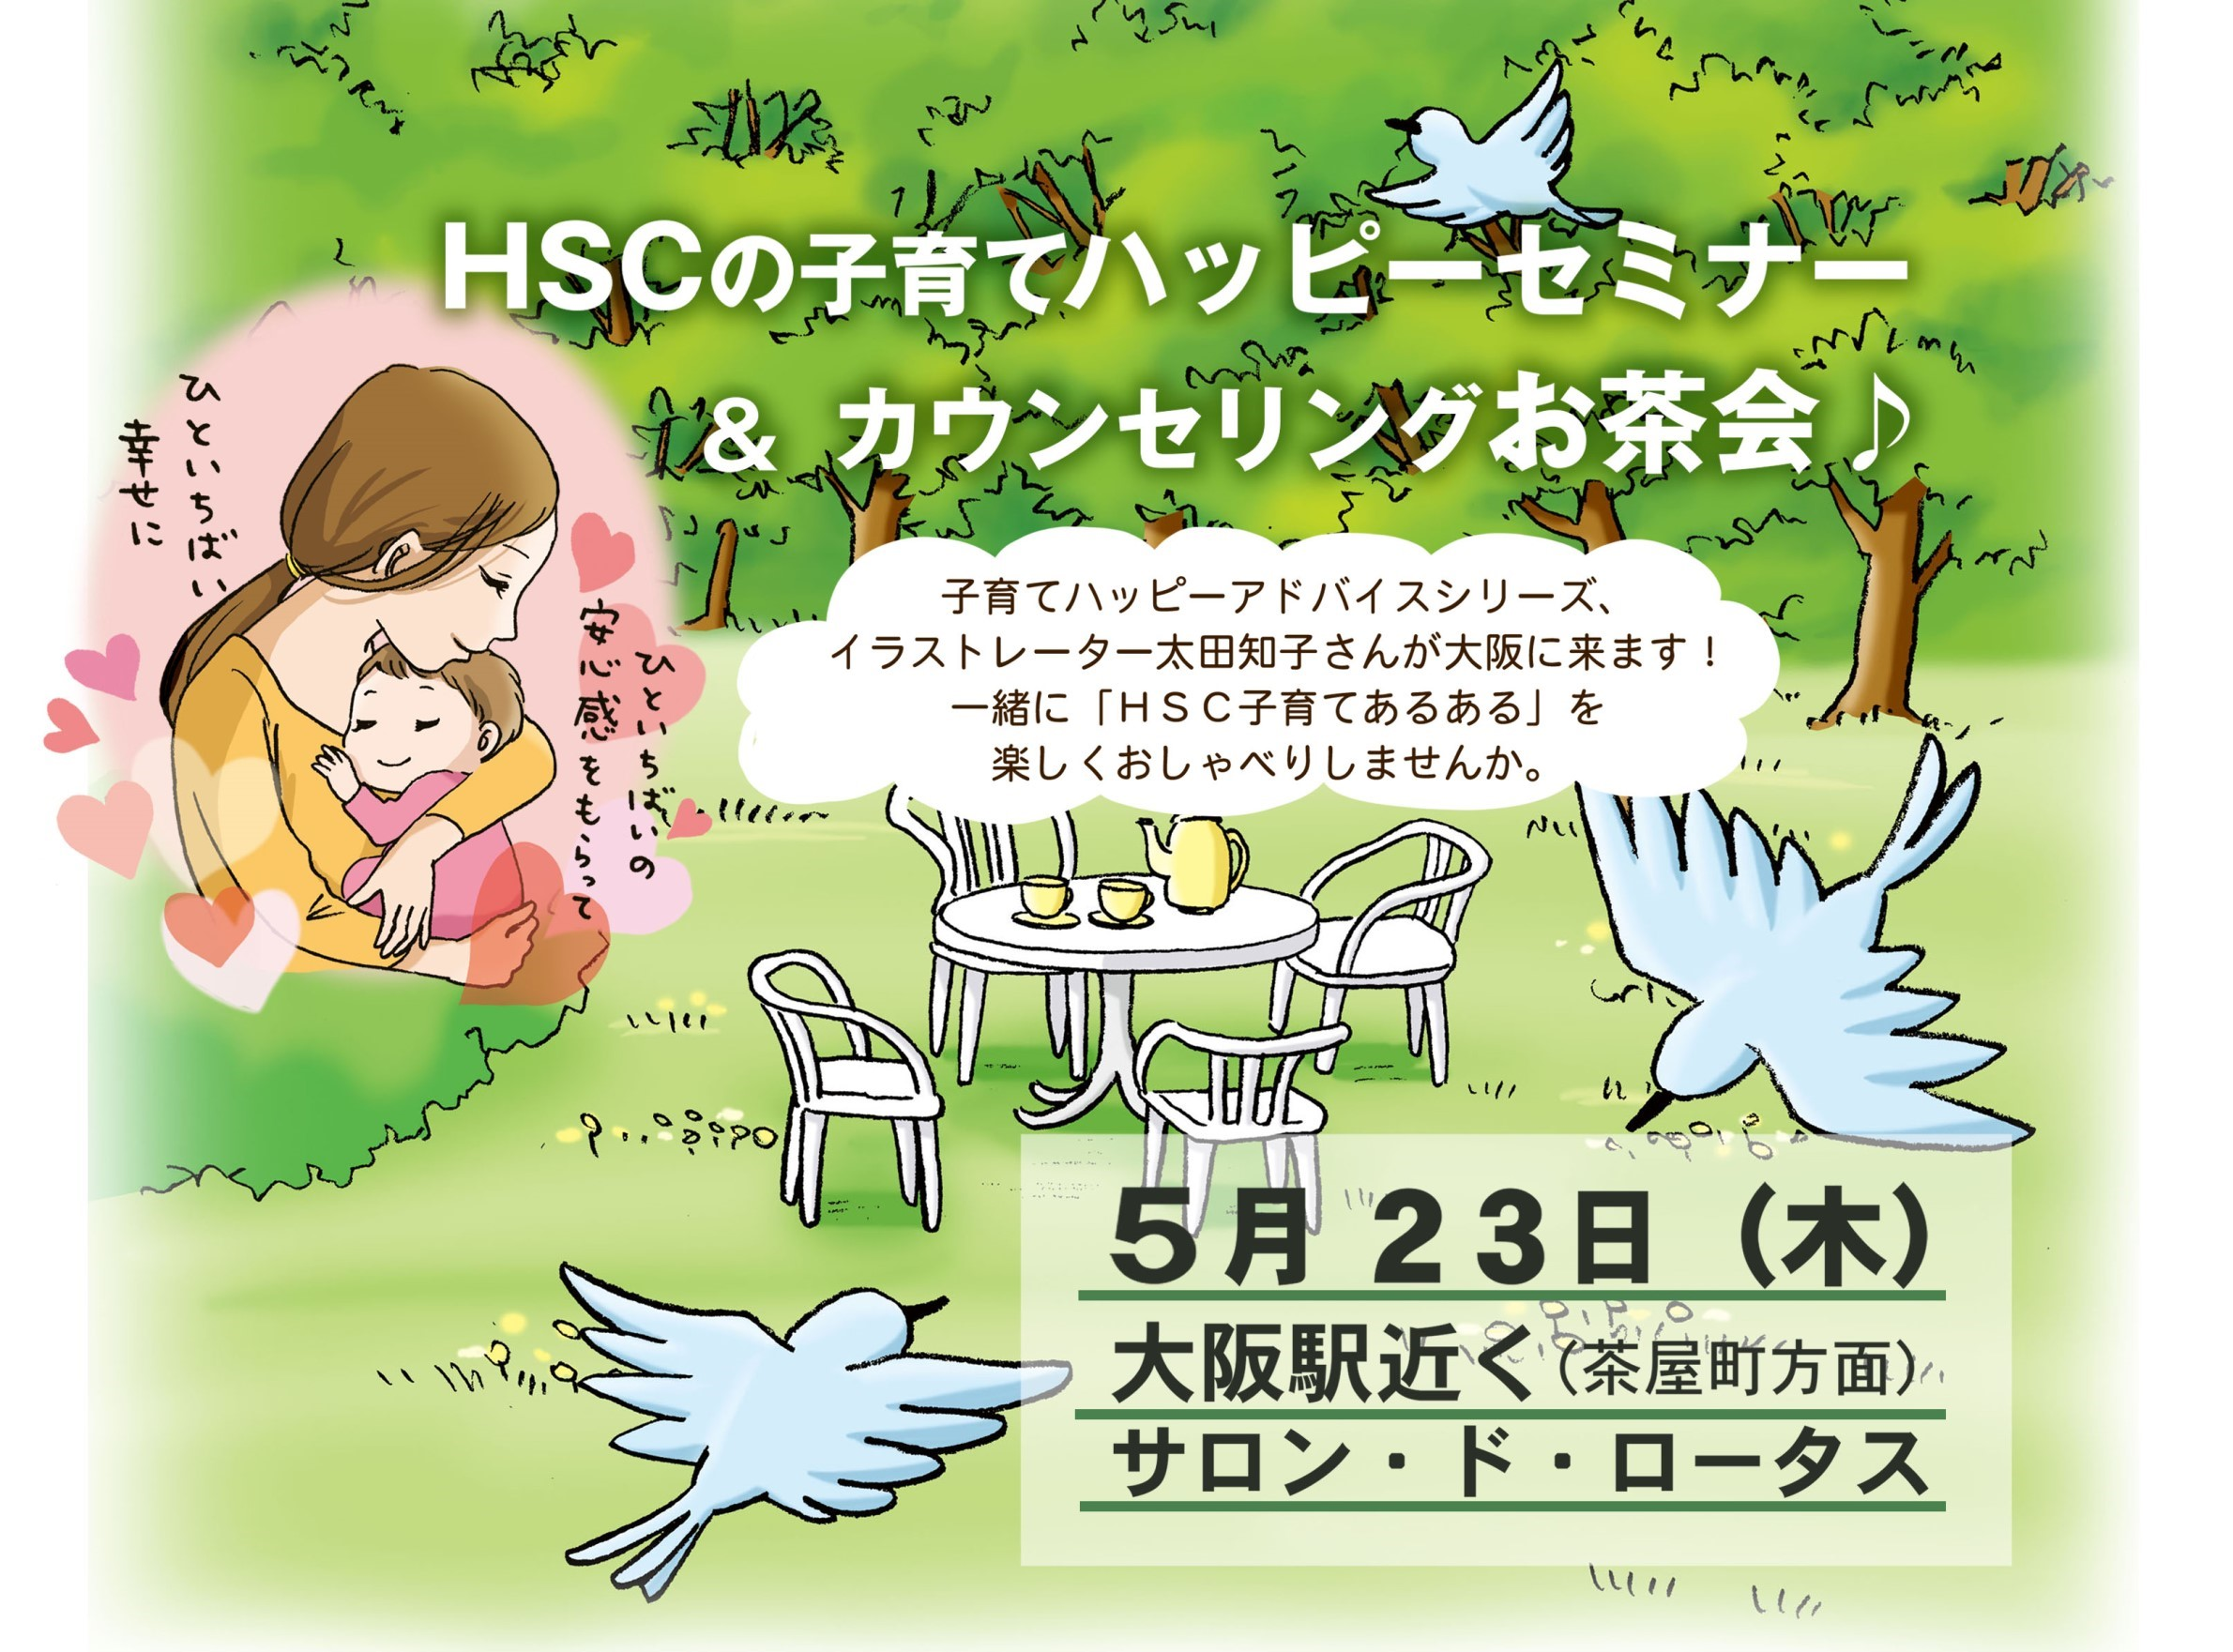 HSC子育てお茶会(太田知子さん)